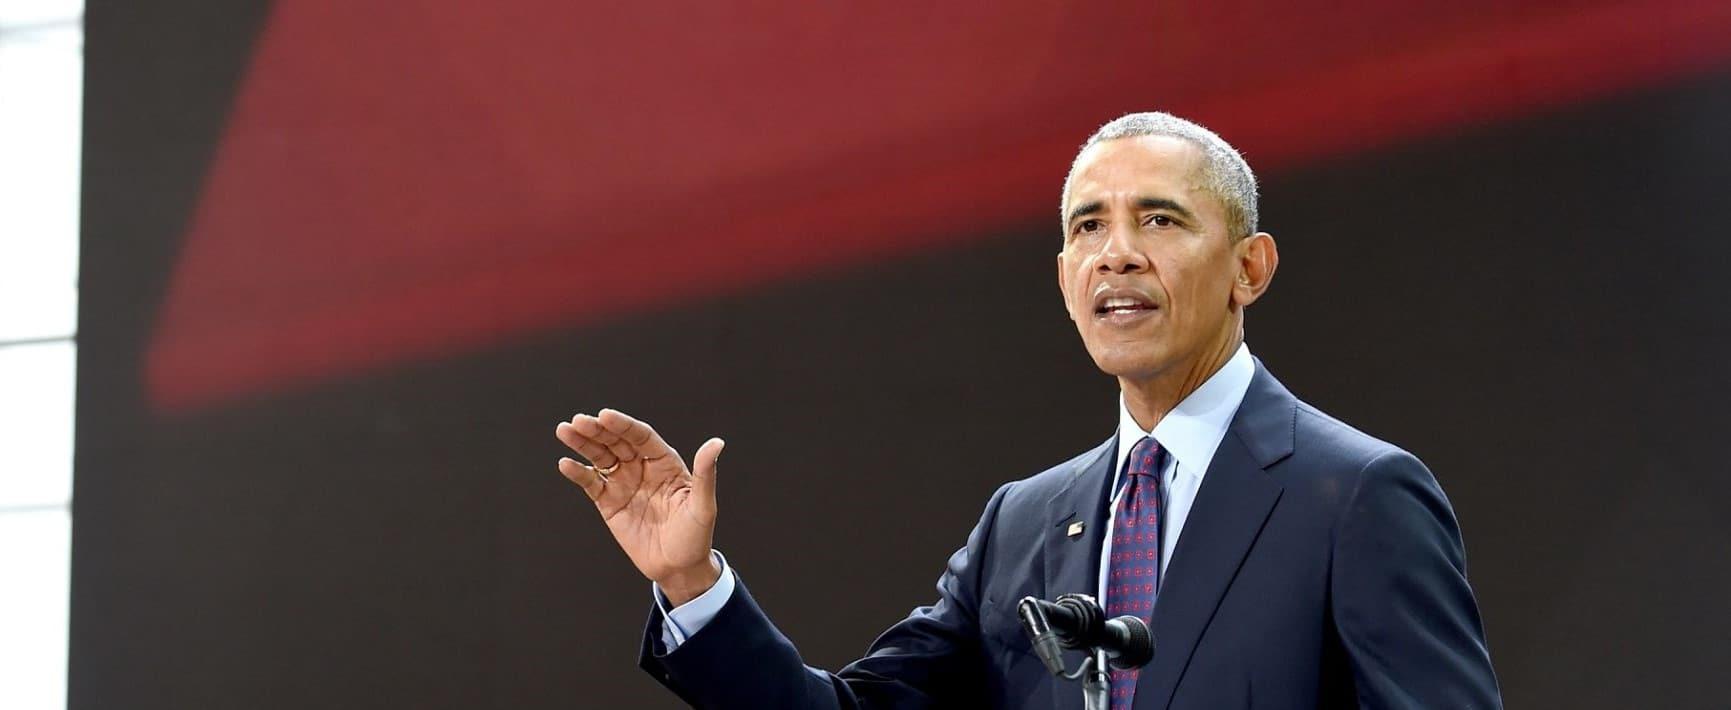 Barack Obama Tickets